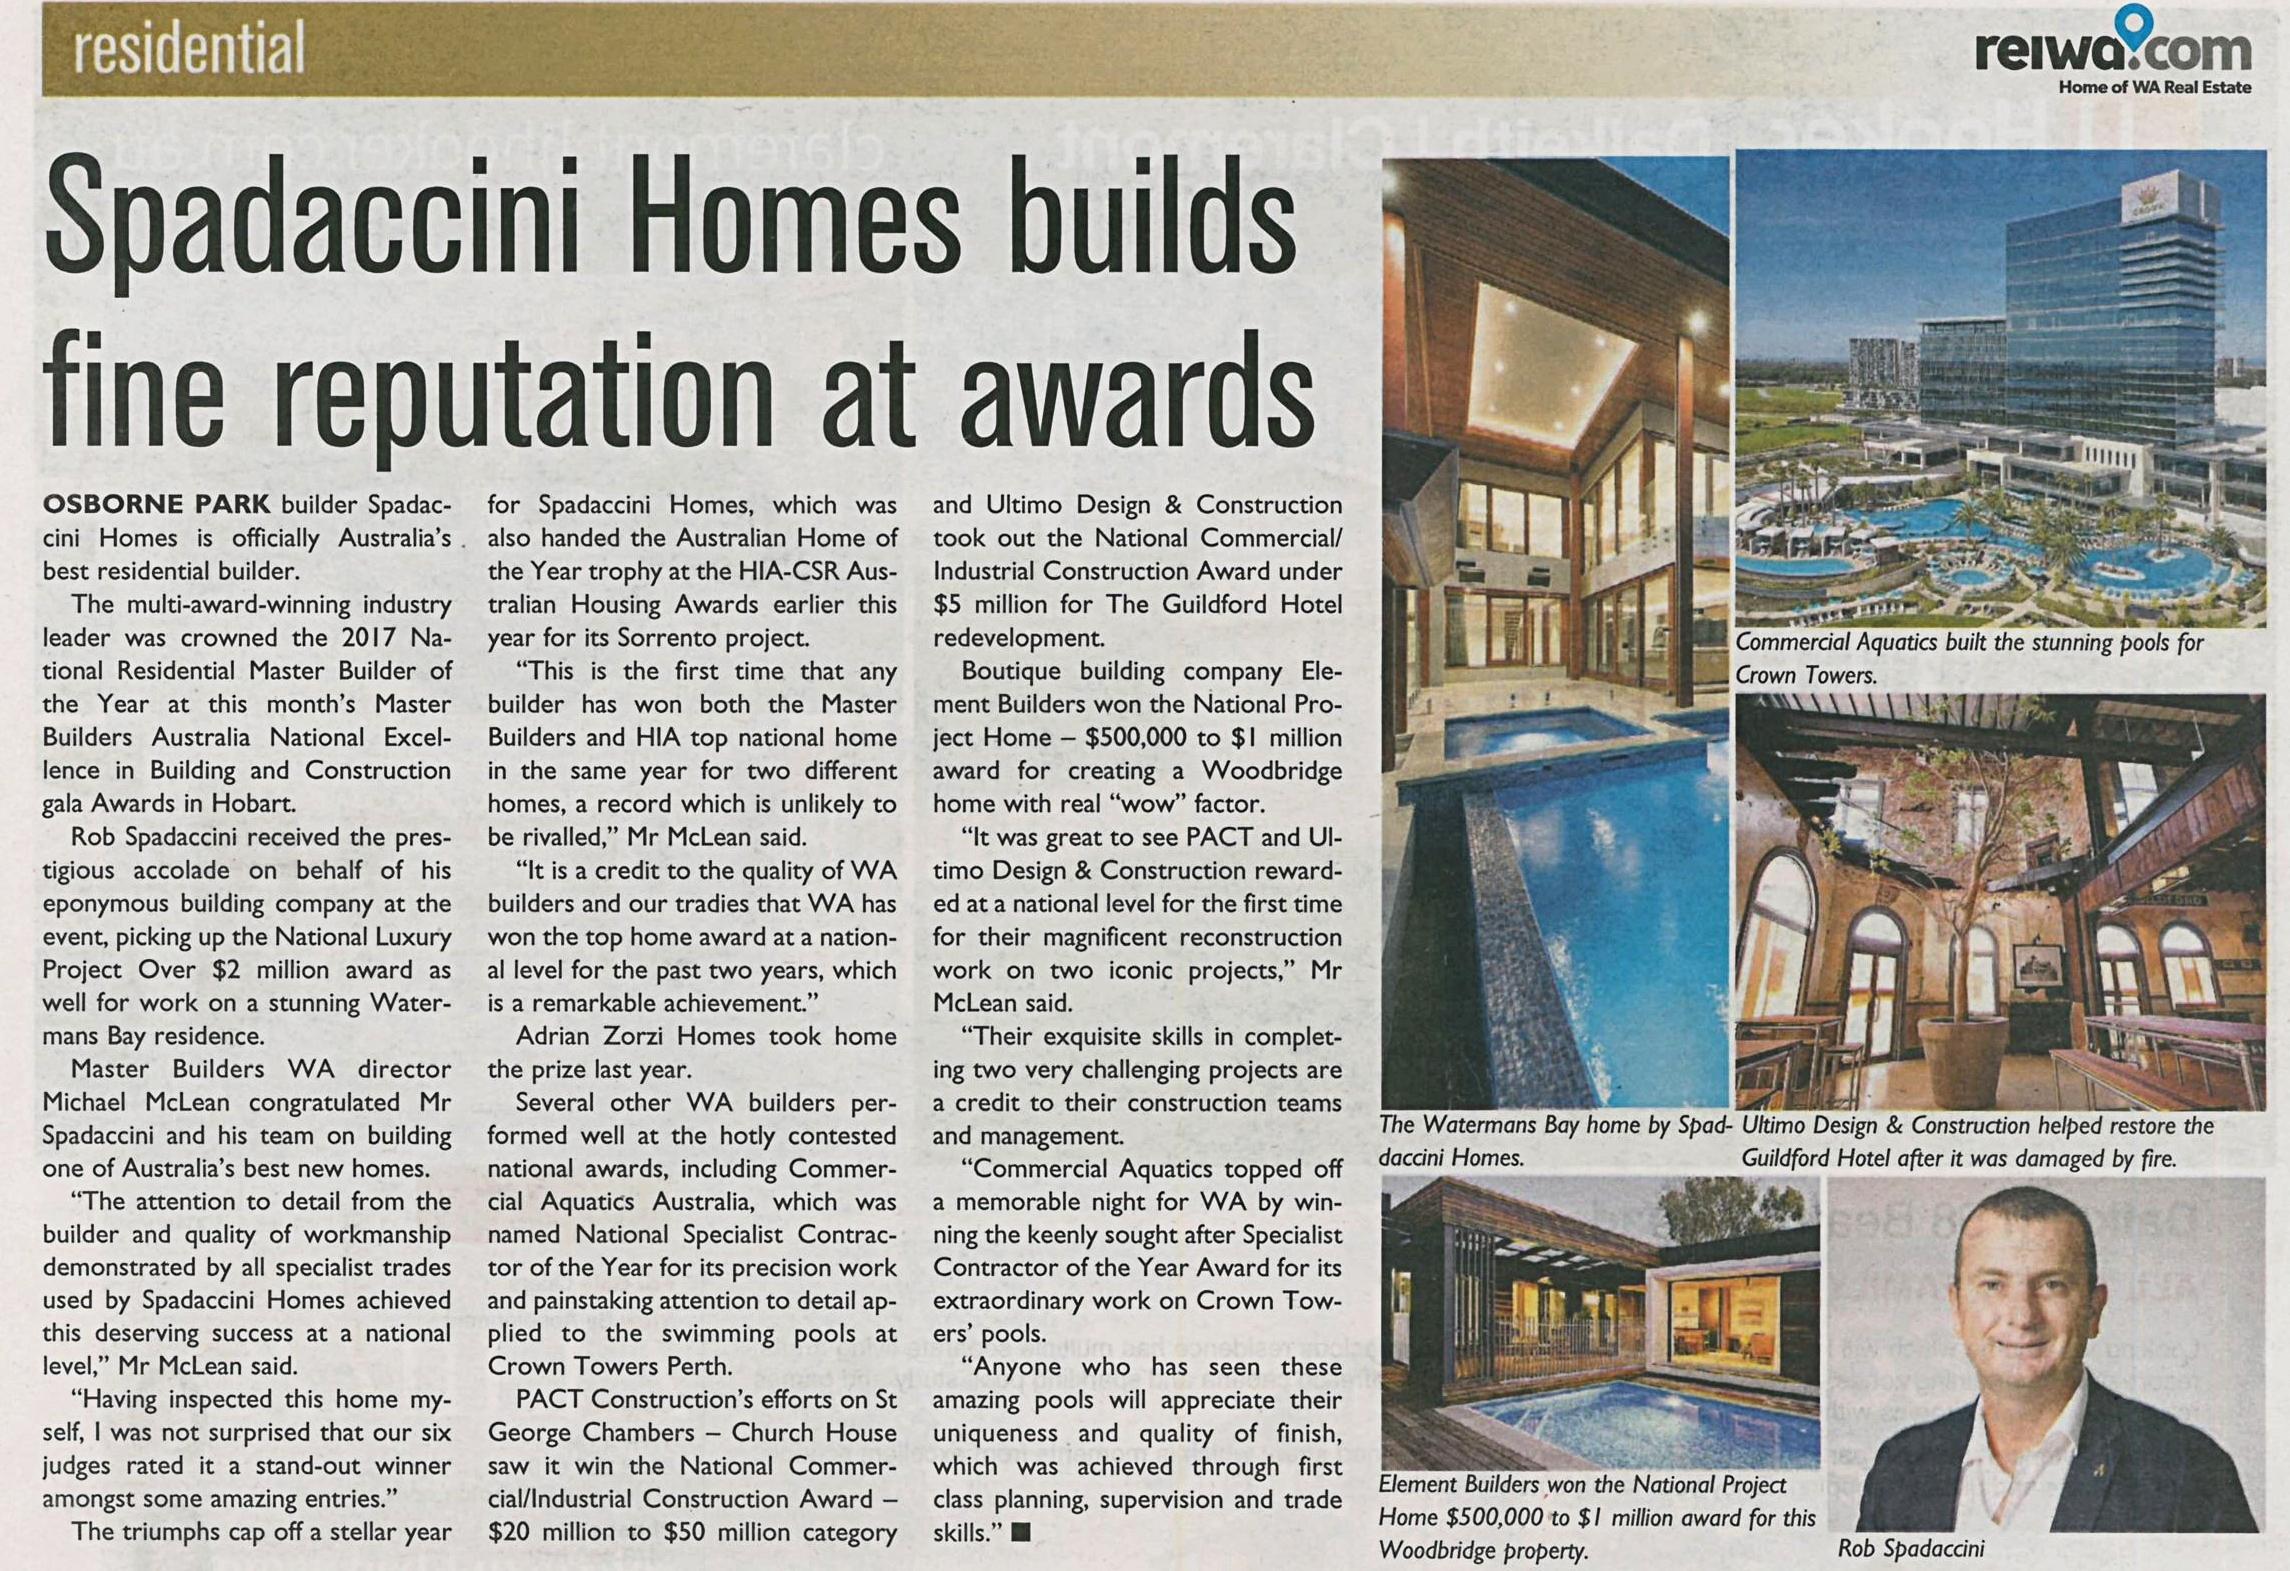 Spadaccini Homes builds fine reputation at awards.jpg